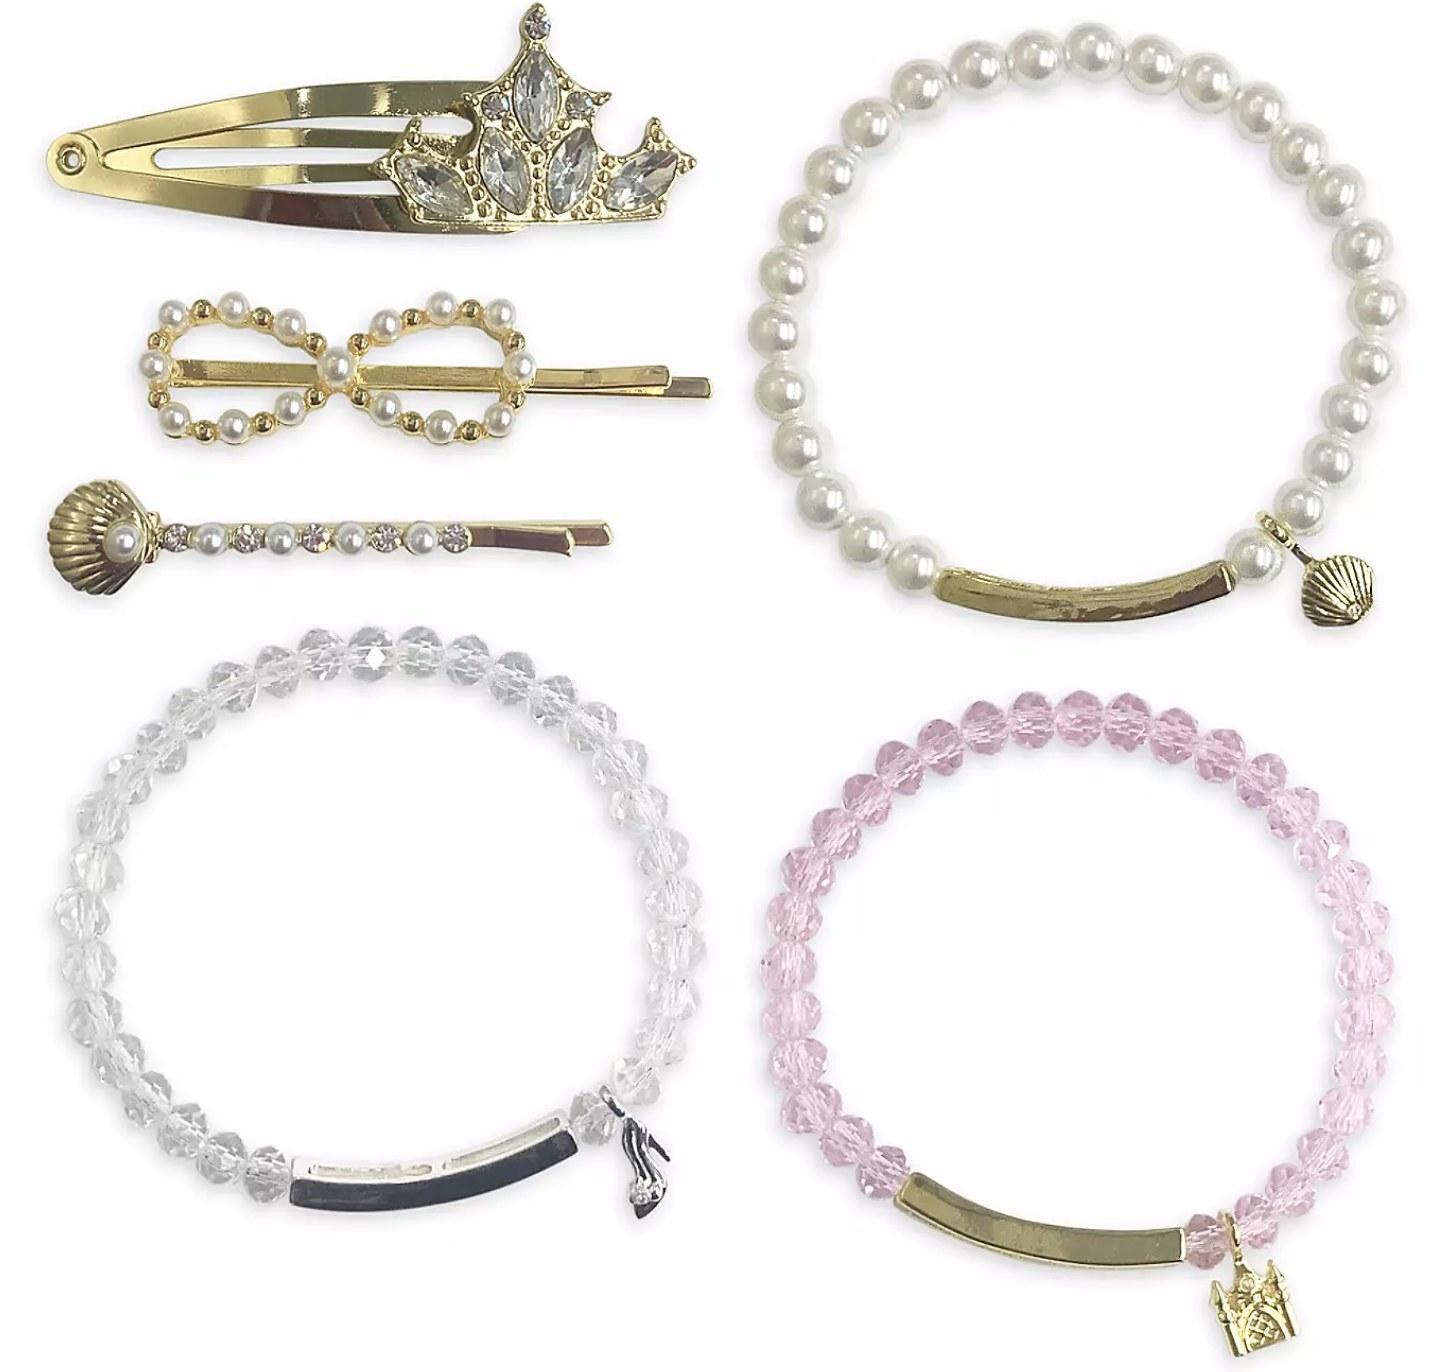 The accessory set